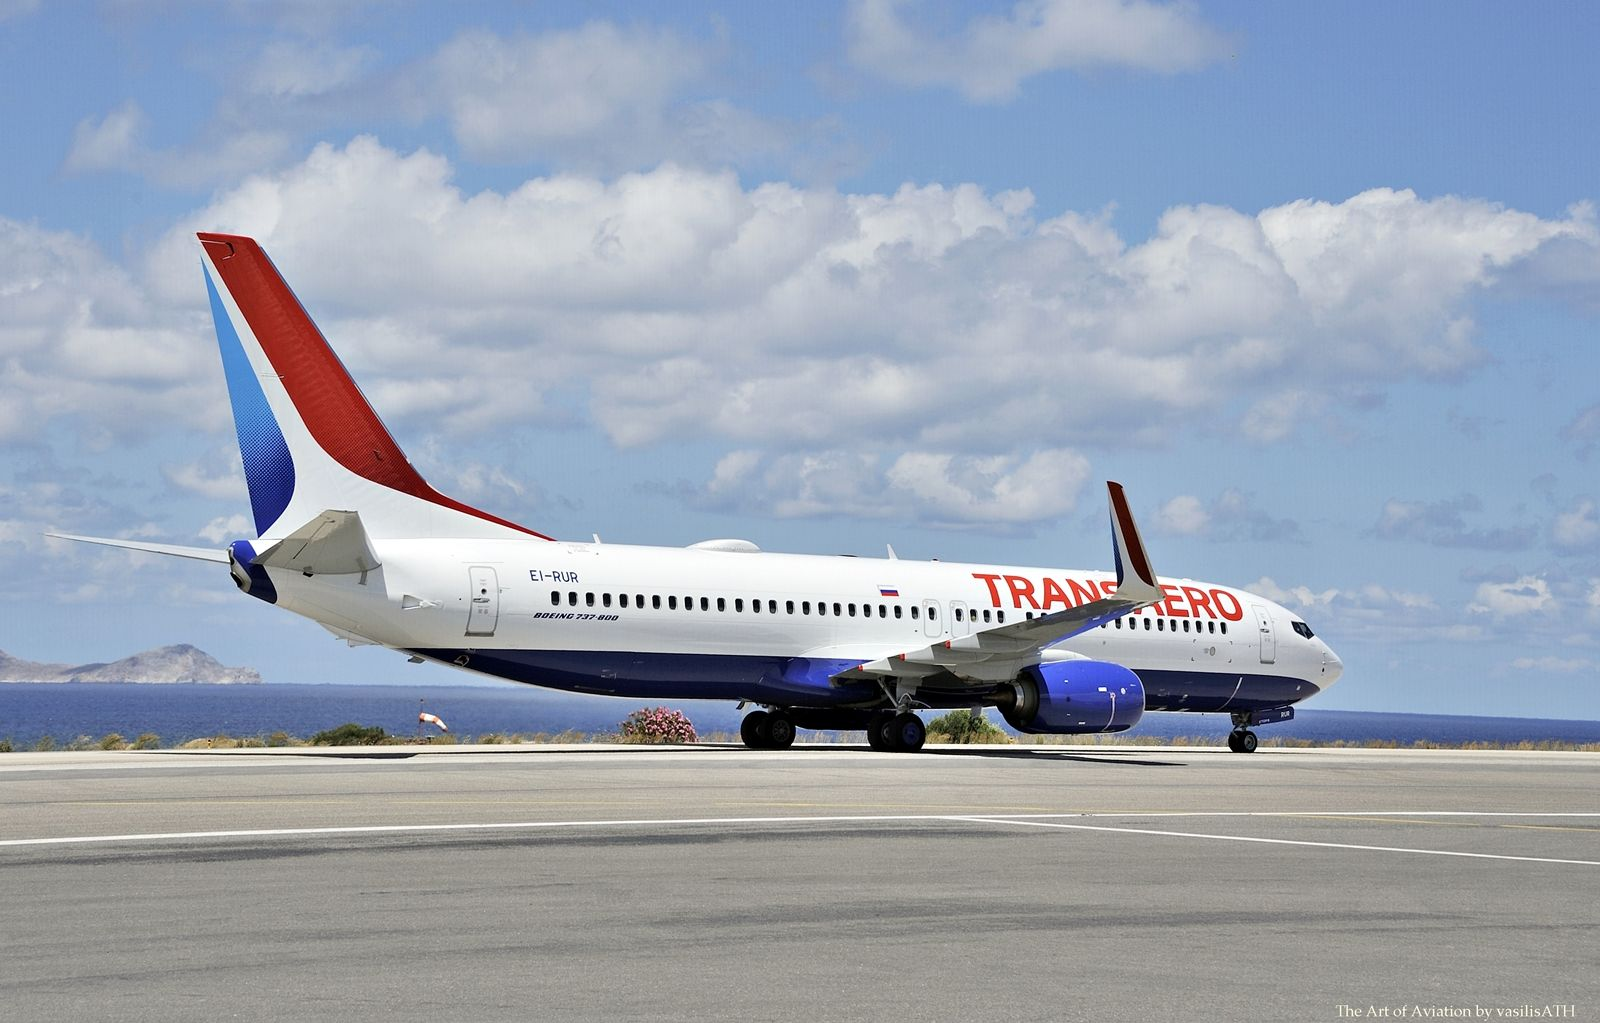 "Transaero Airlines Boeing 737-800 - cn 44435 / 5351 EI-RUR First Flight Mar 2015 Age 0.6 Years Test registration N1782B Heraklion International Airport, ""Nikos Kazantzakis"" (IATA: HER, ICAO: LGIR)"